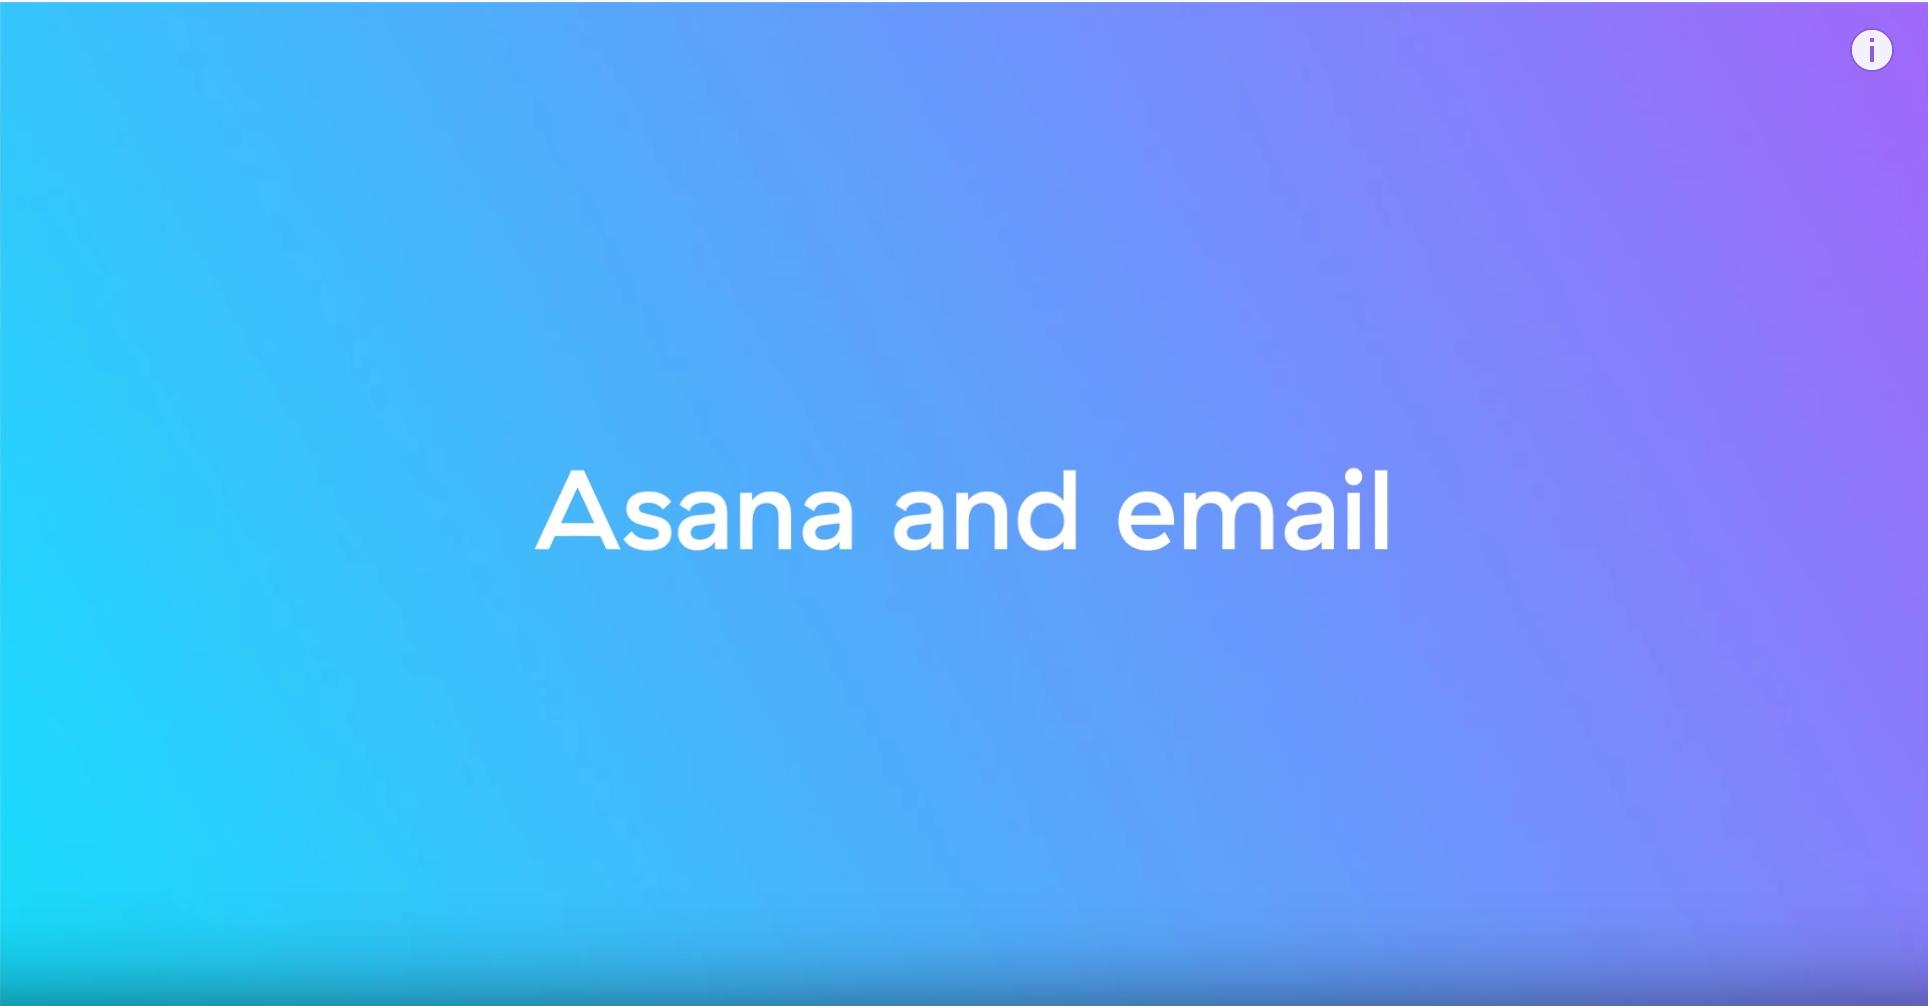 Asana and email